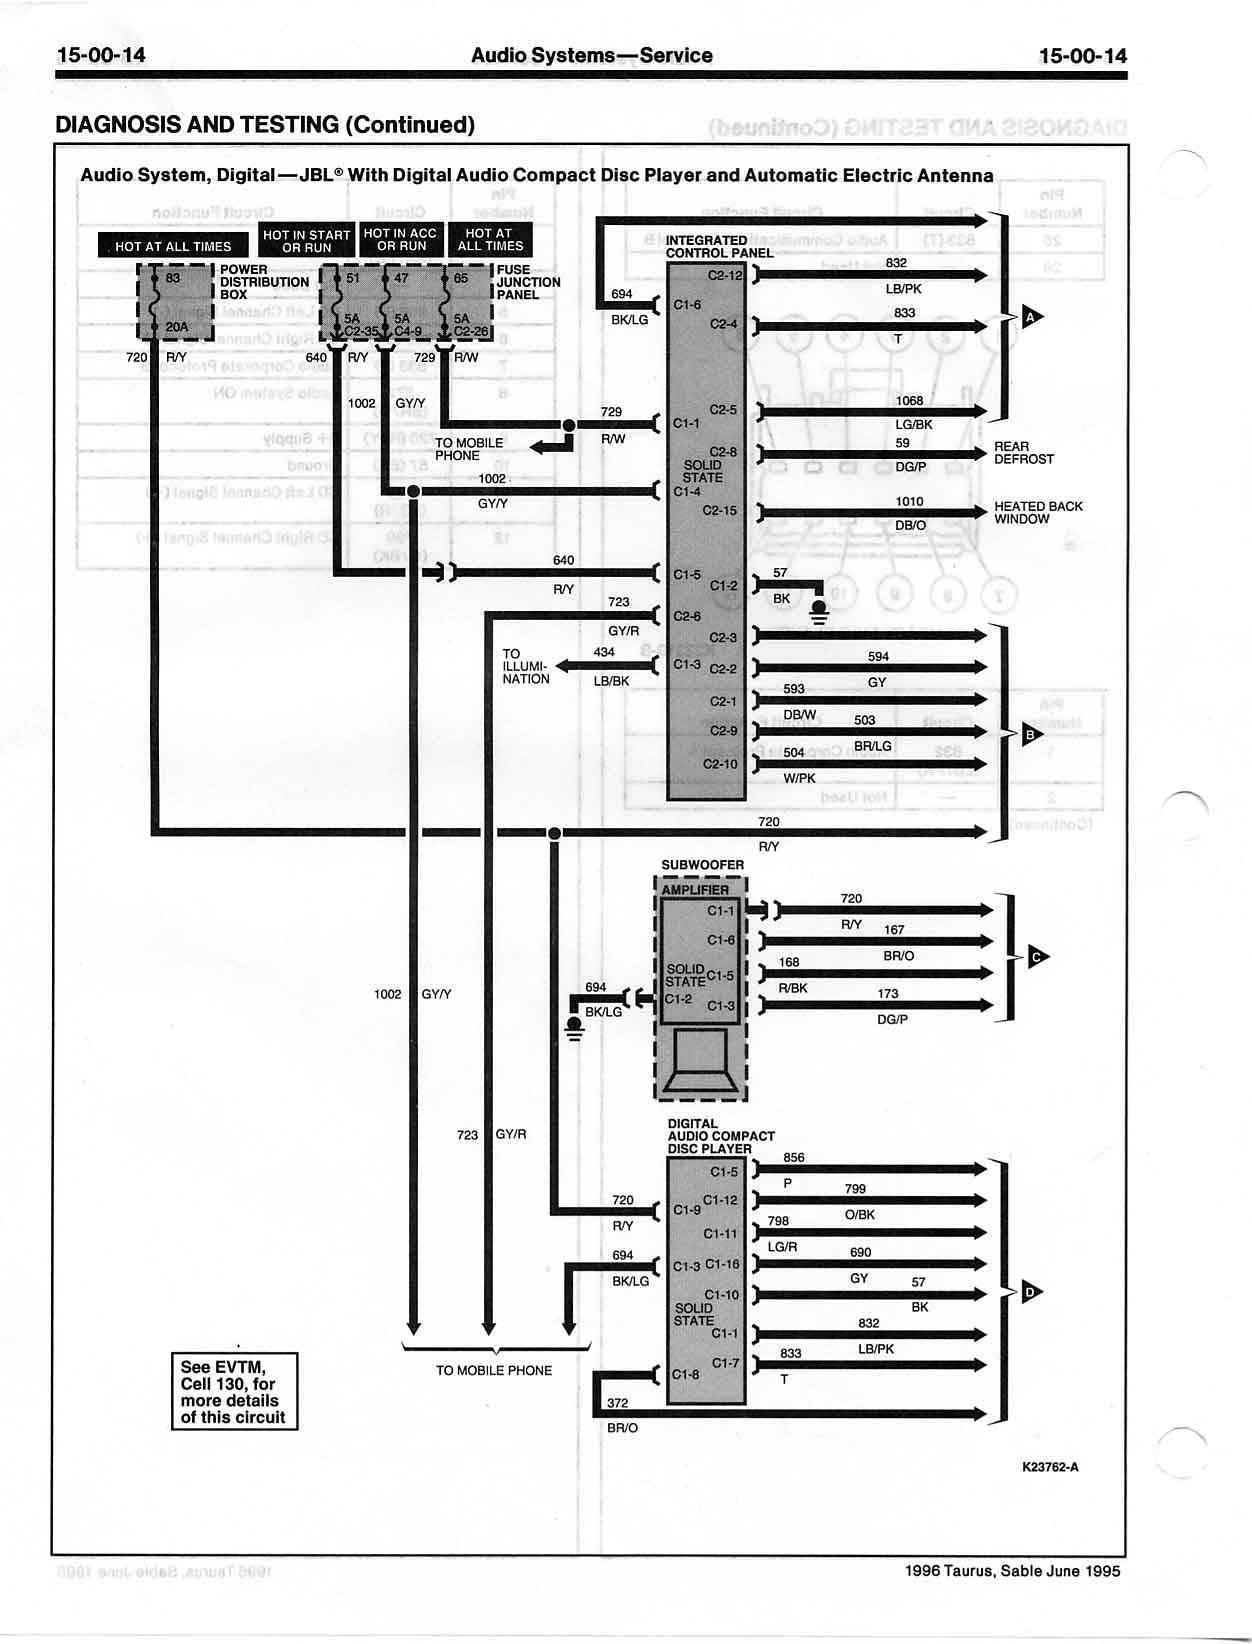 2001 Ford Taurus Rcu Wiring Diagram 1995 Ford F 350 Ac Wiring Diagram Pump Tukune Jeanjaures37 Fr